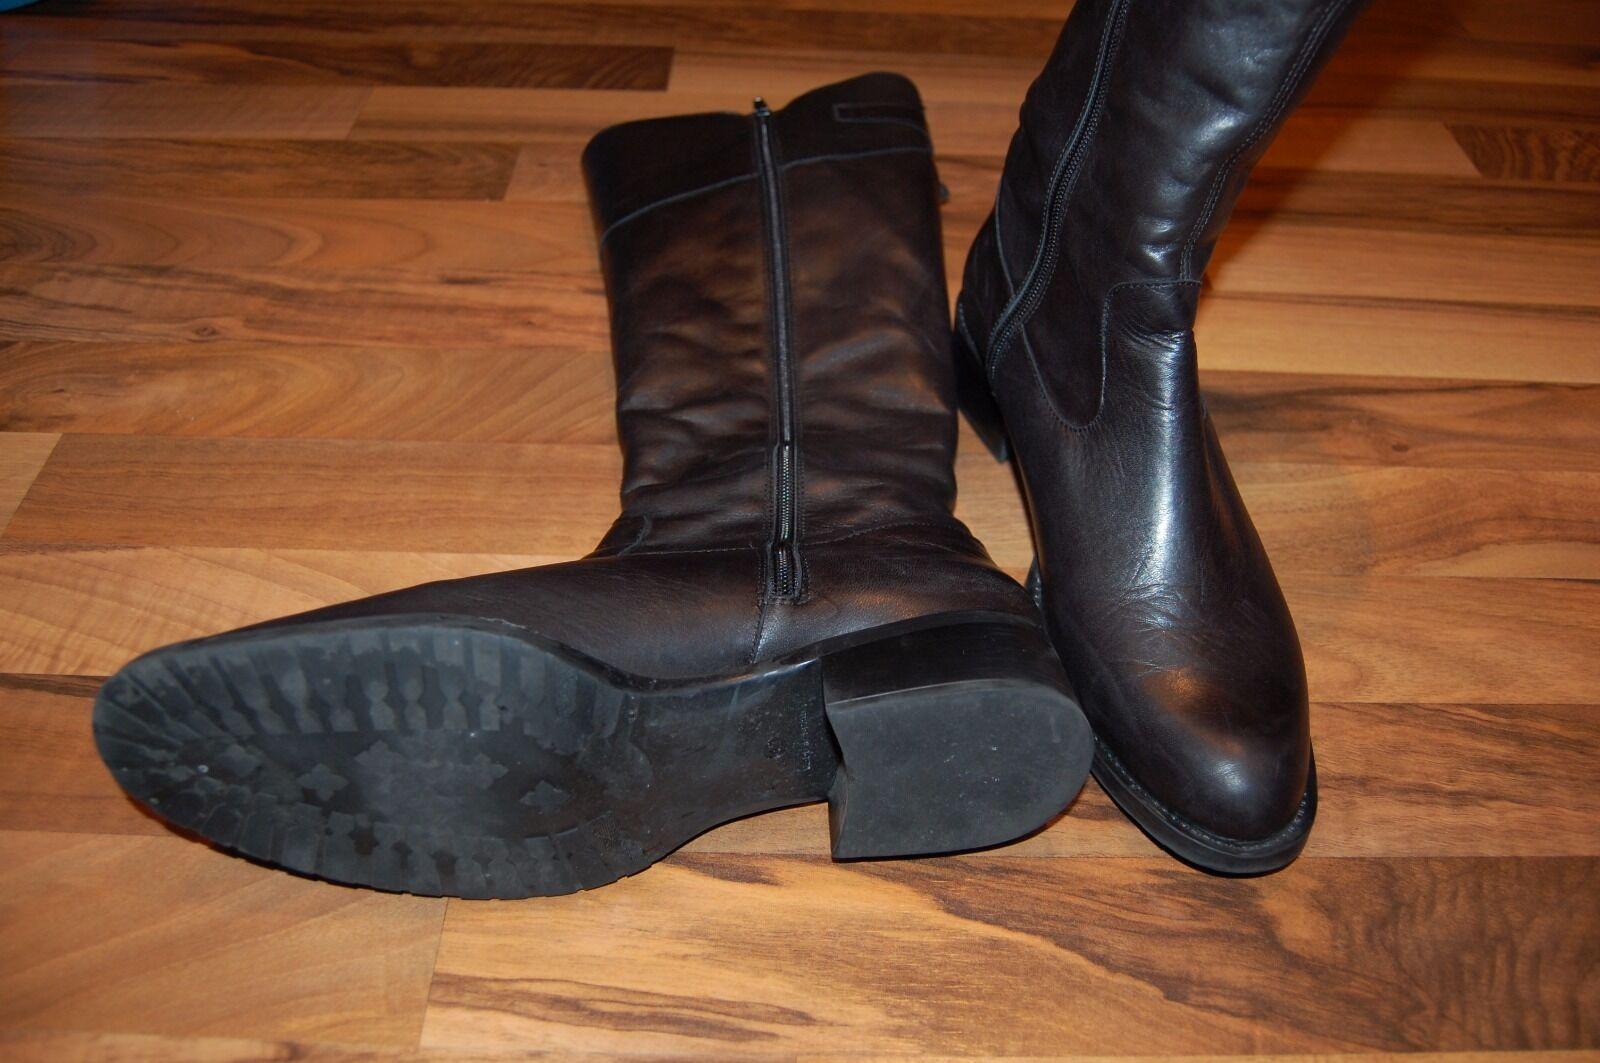 Seva - - Stiefel - Echtleder - Seva schwarz - Gr. 41 c65249